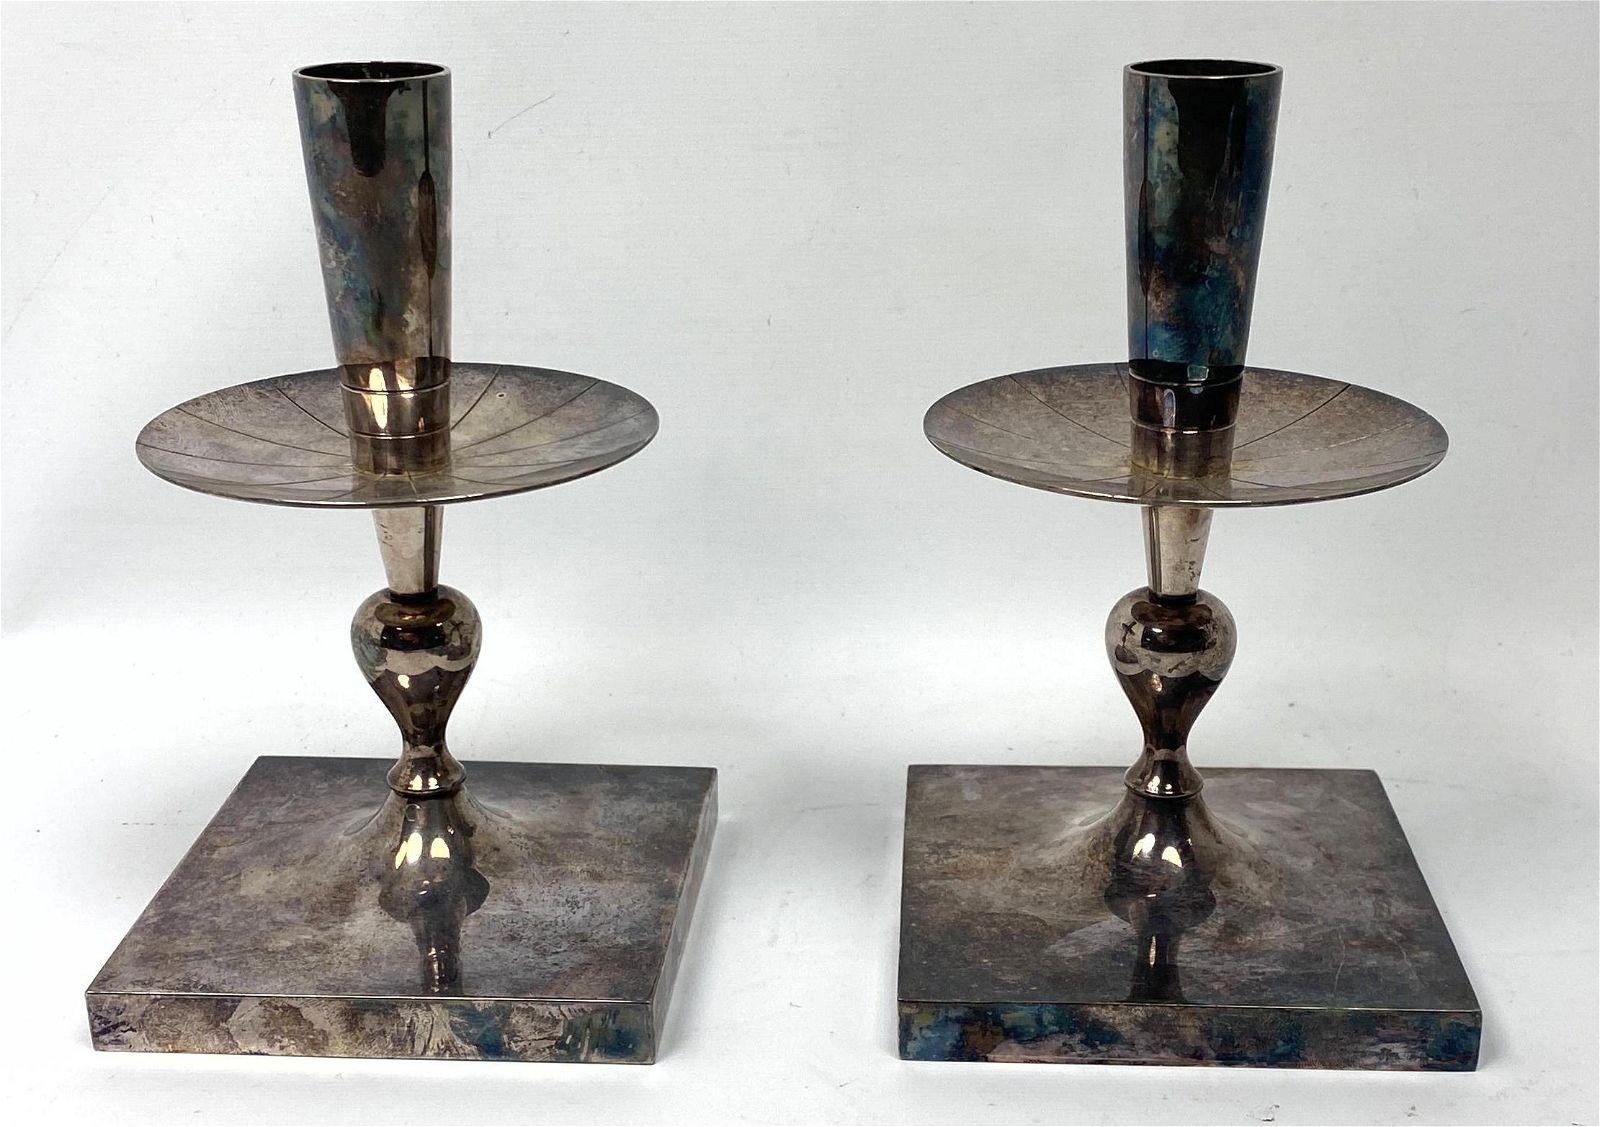 Pr HEIRLOOM Silver Plate Candlesticks. TOMMI PARZINGER